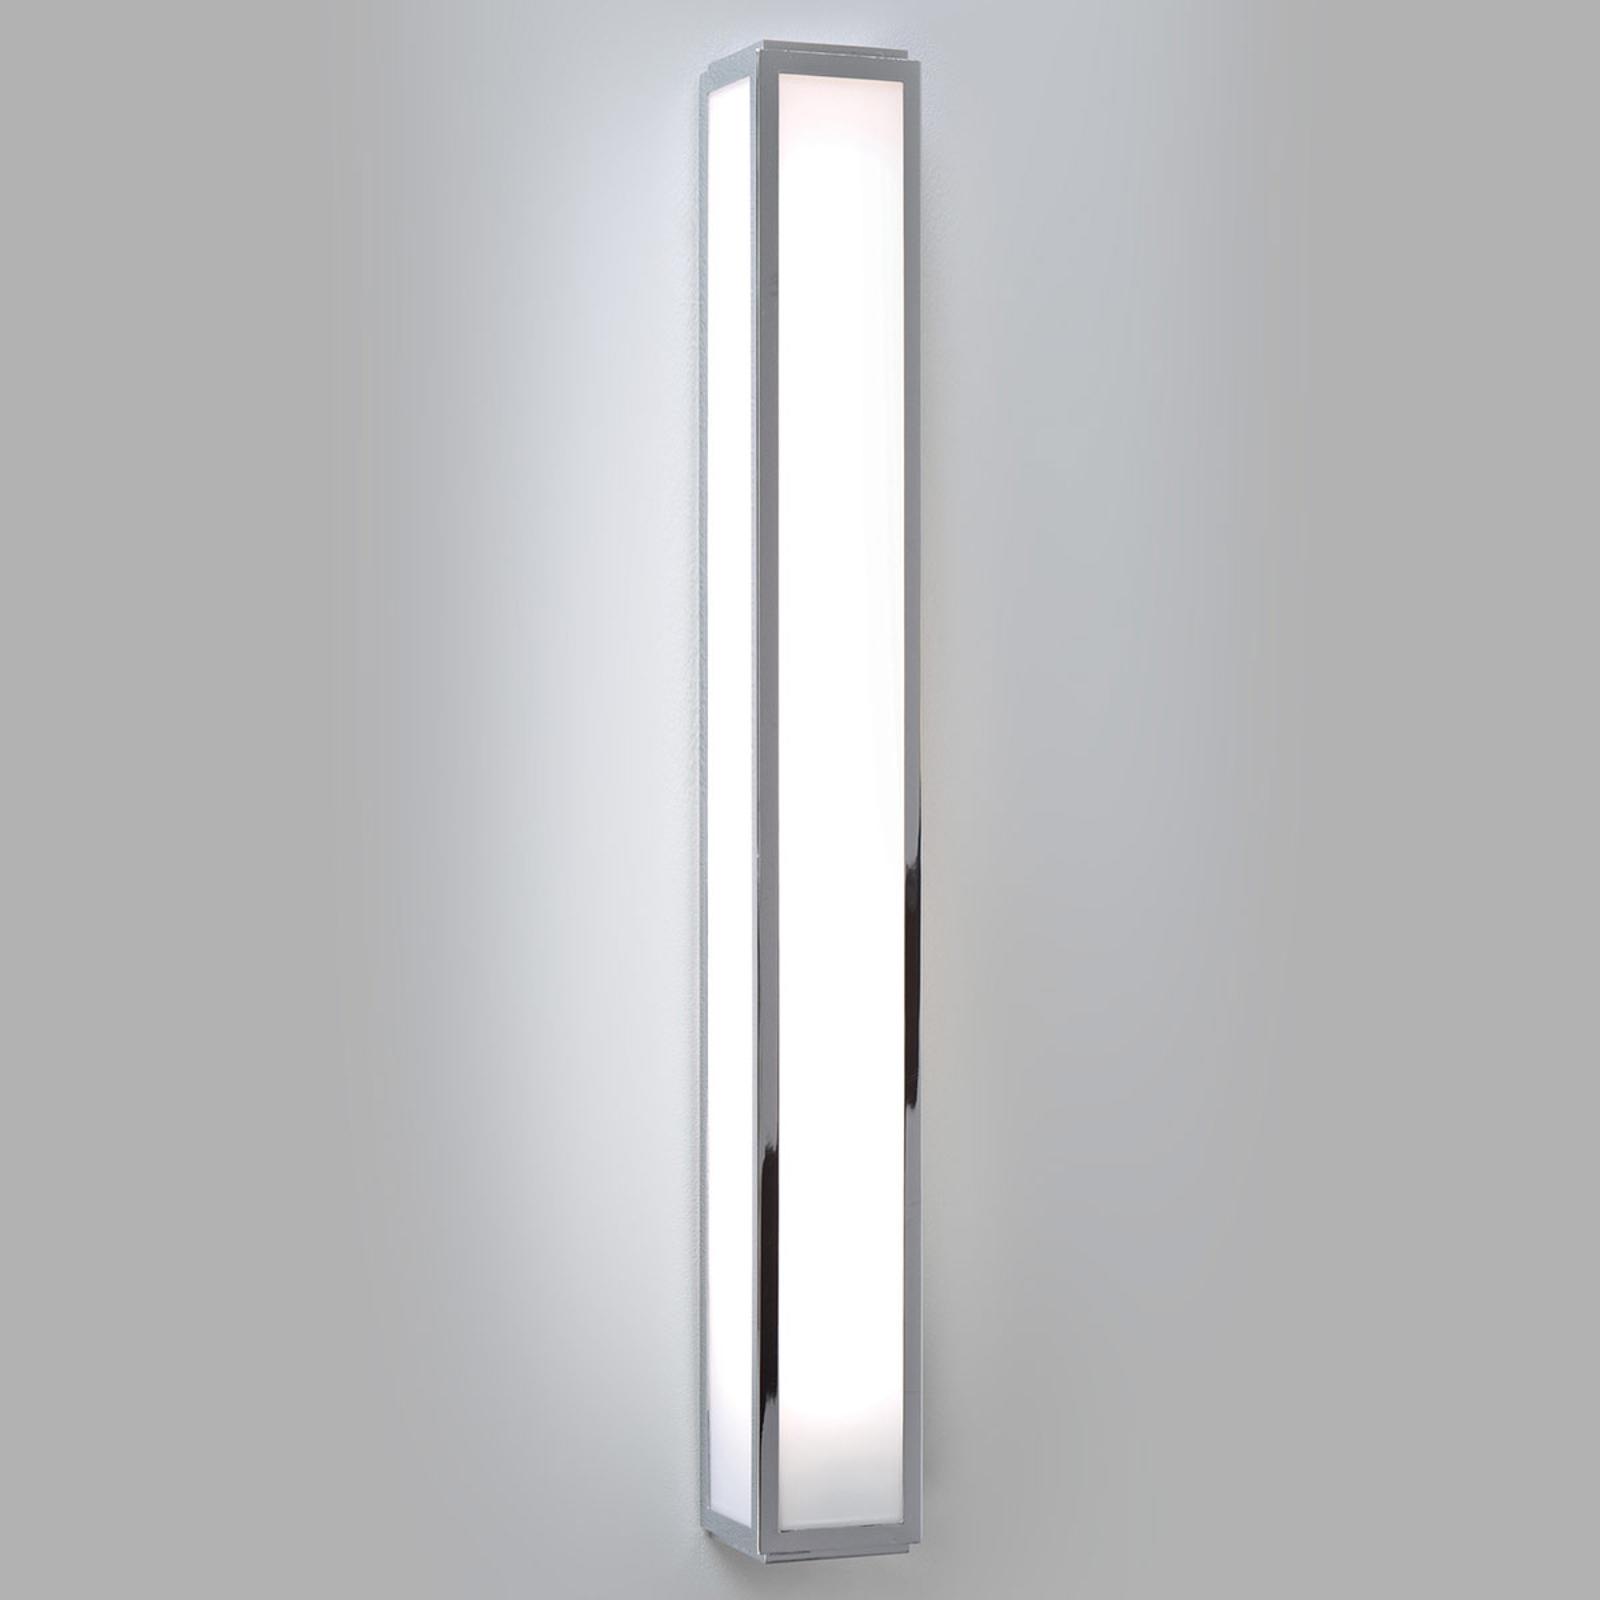 Astro Mashiko - LED-Wandleuchte fürs Bad, 60 cm